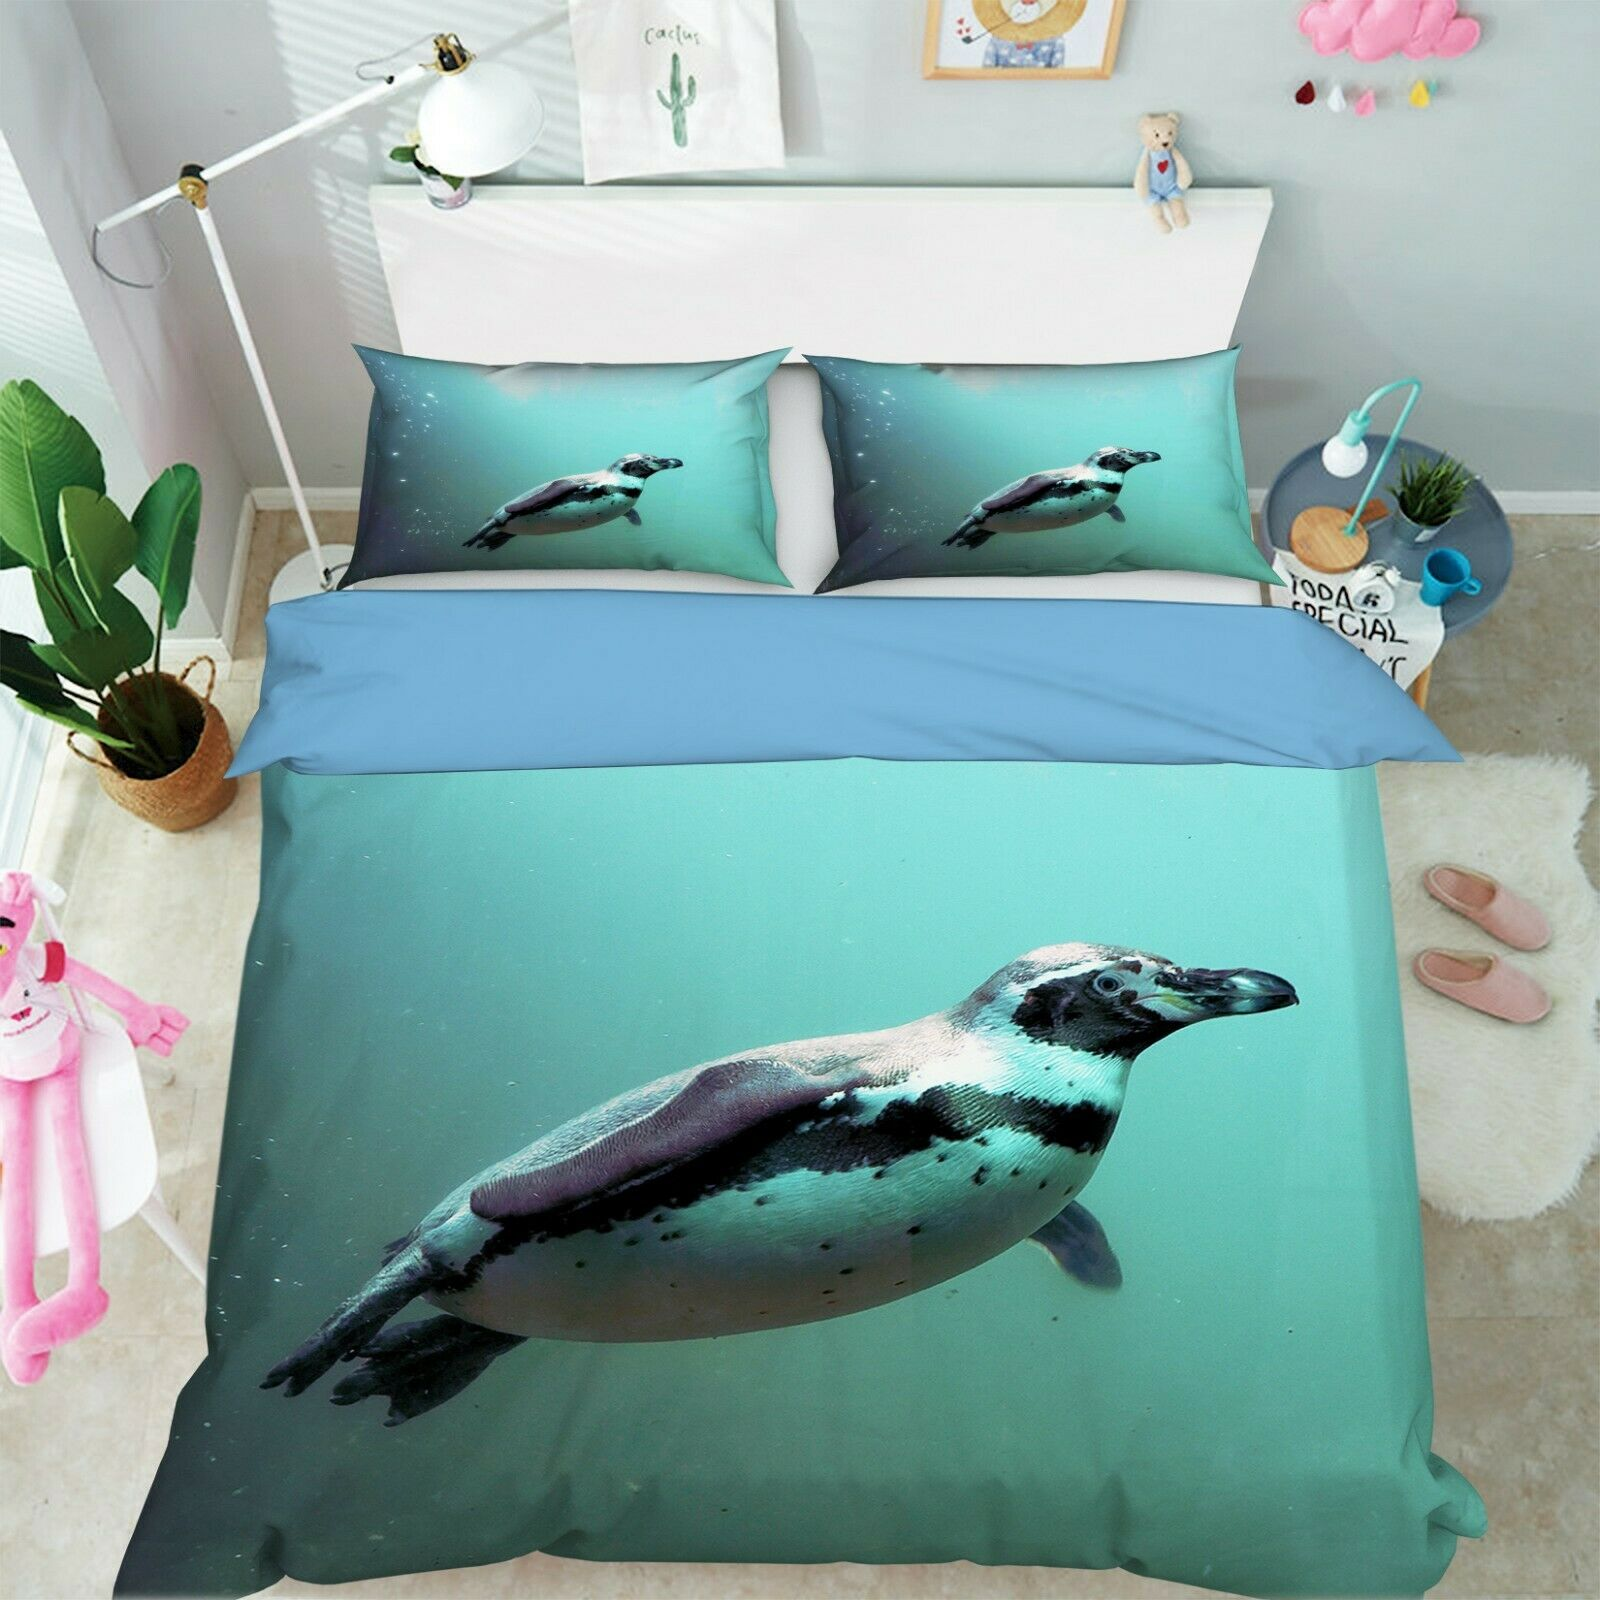 3D Penguin I77 Animal Bed Pillowcases Quilt Duvet Cover Queen King Angelia